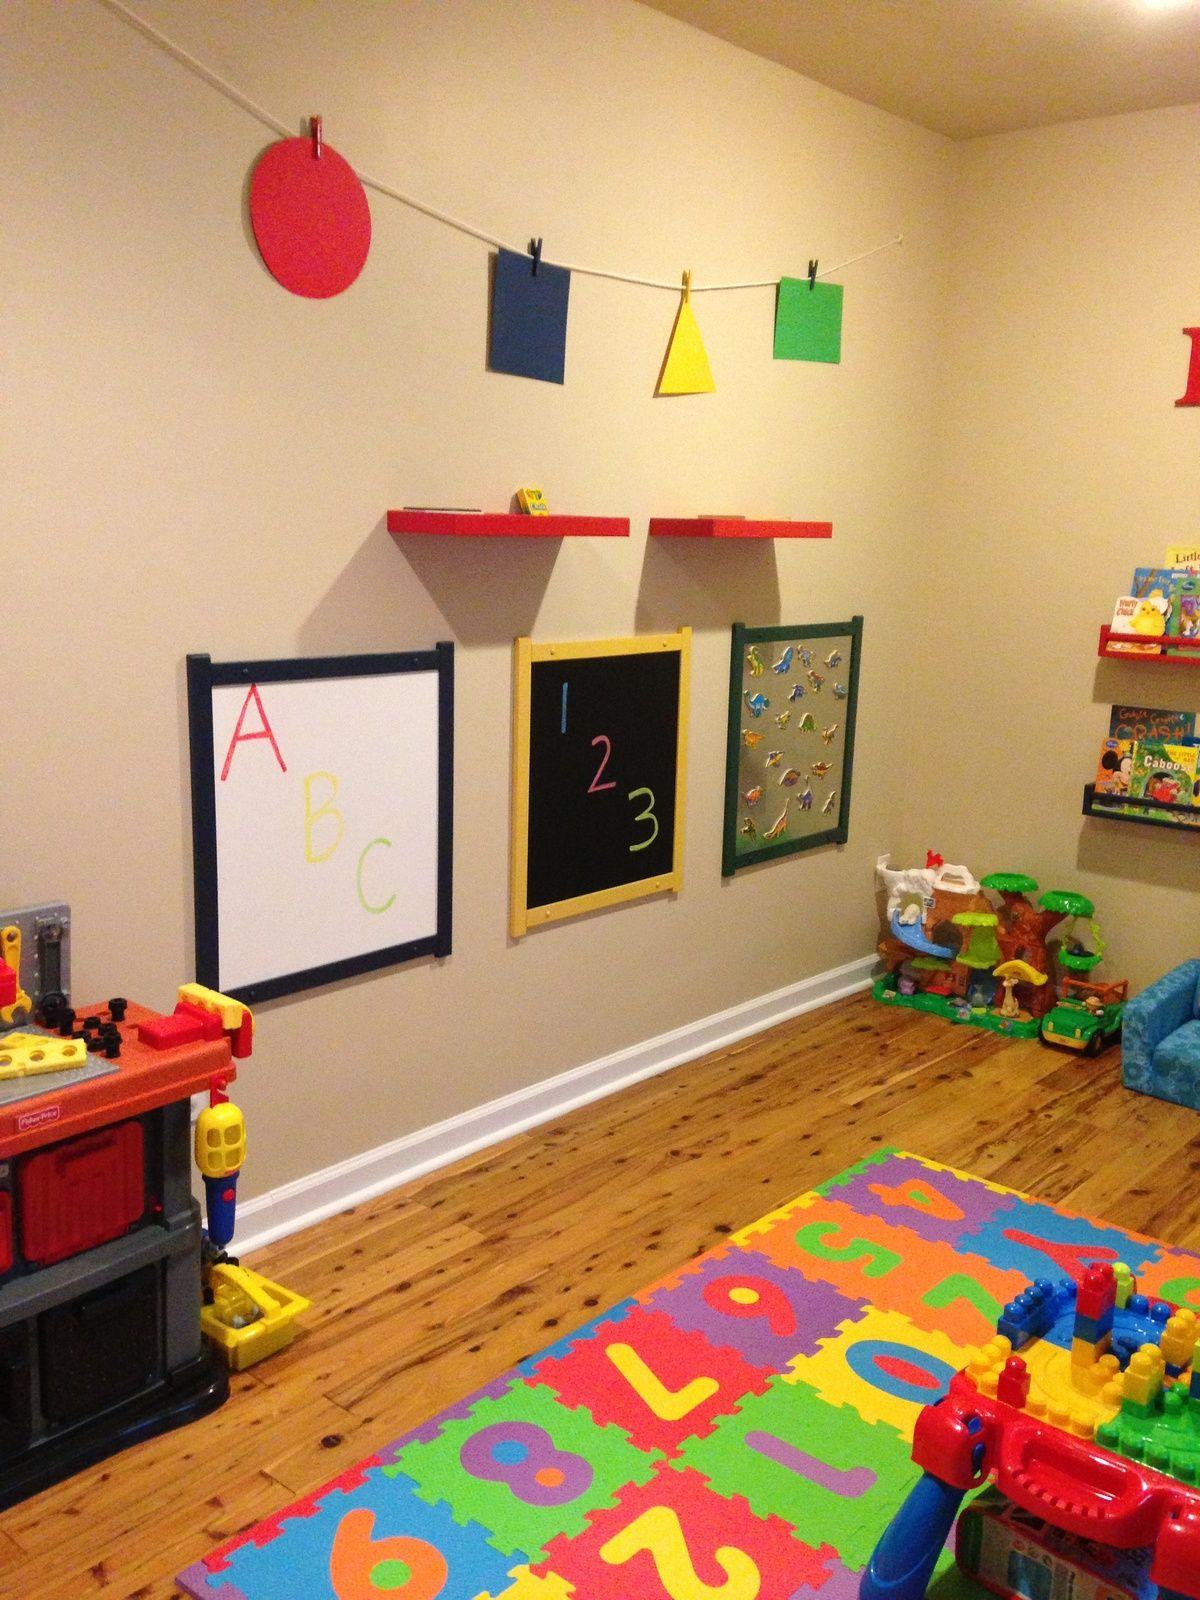 Playroom Colorful Playroom Playroom Storage Meara